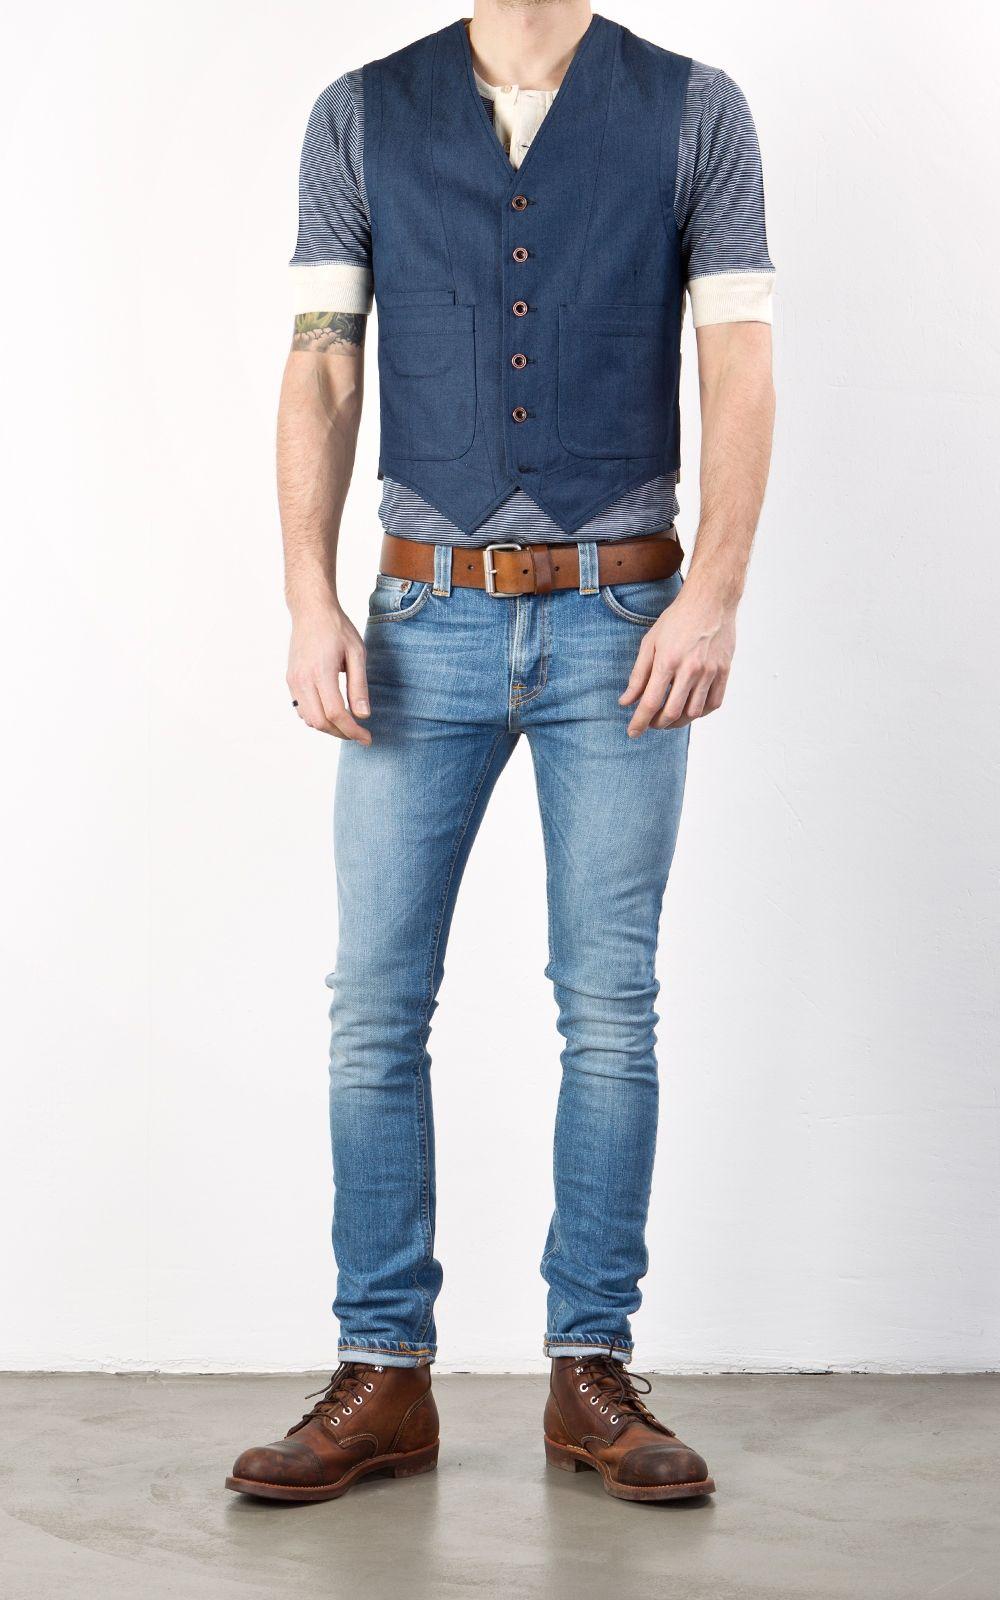 1ff9f1bbefe Nudie Jeans Tube Tom Org. Blue Lightning   FIT JEANS   Nudie jeans ...